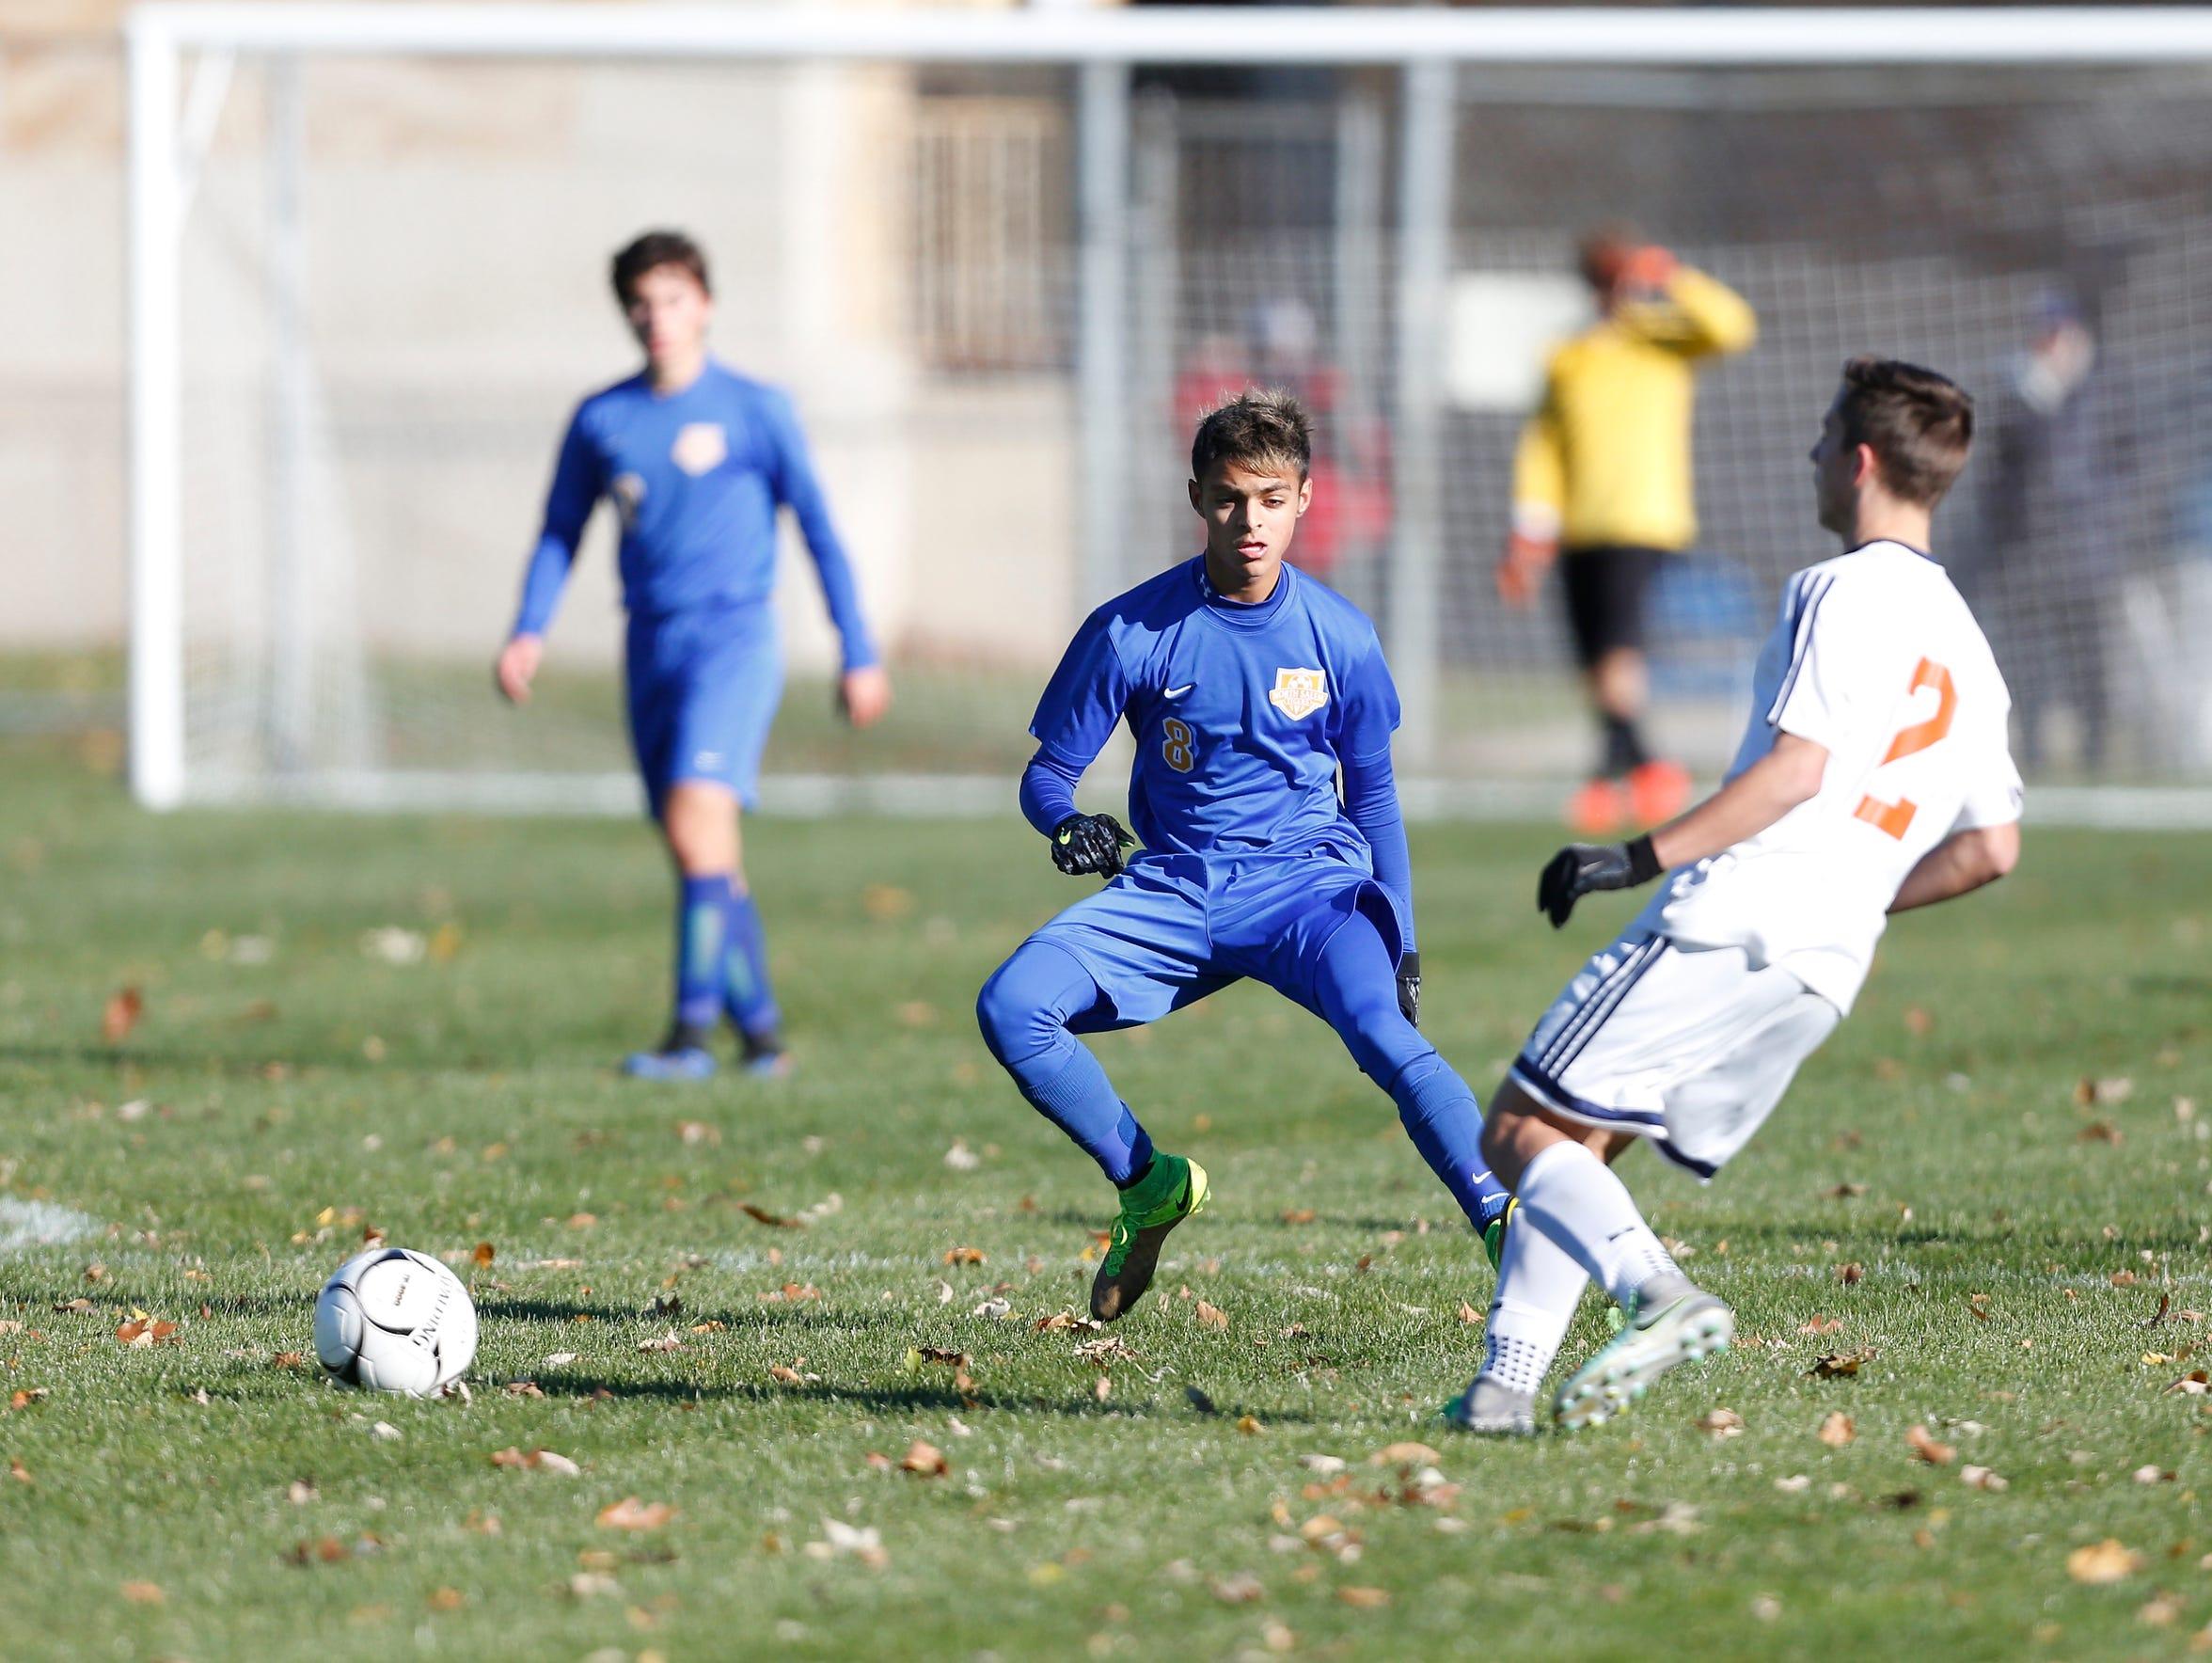 North Salem defeats Potsdam 7-0 in the Class C boys